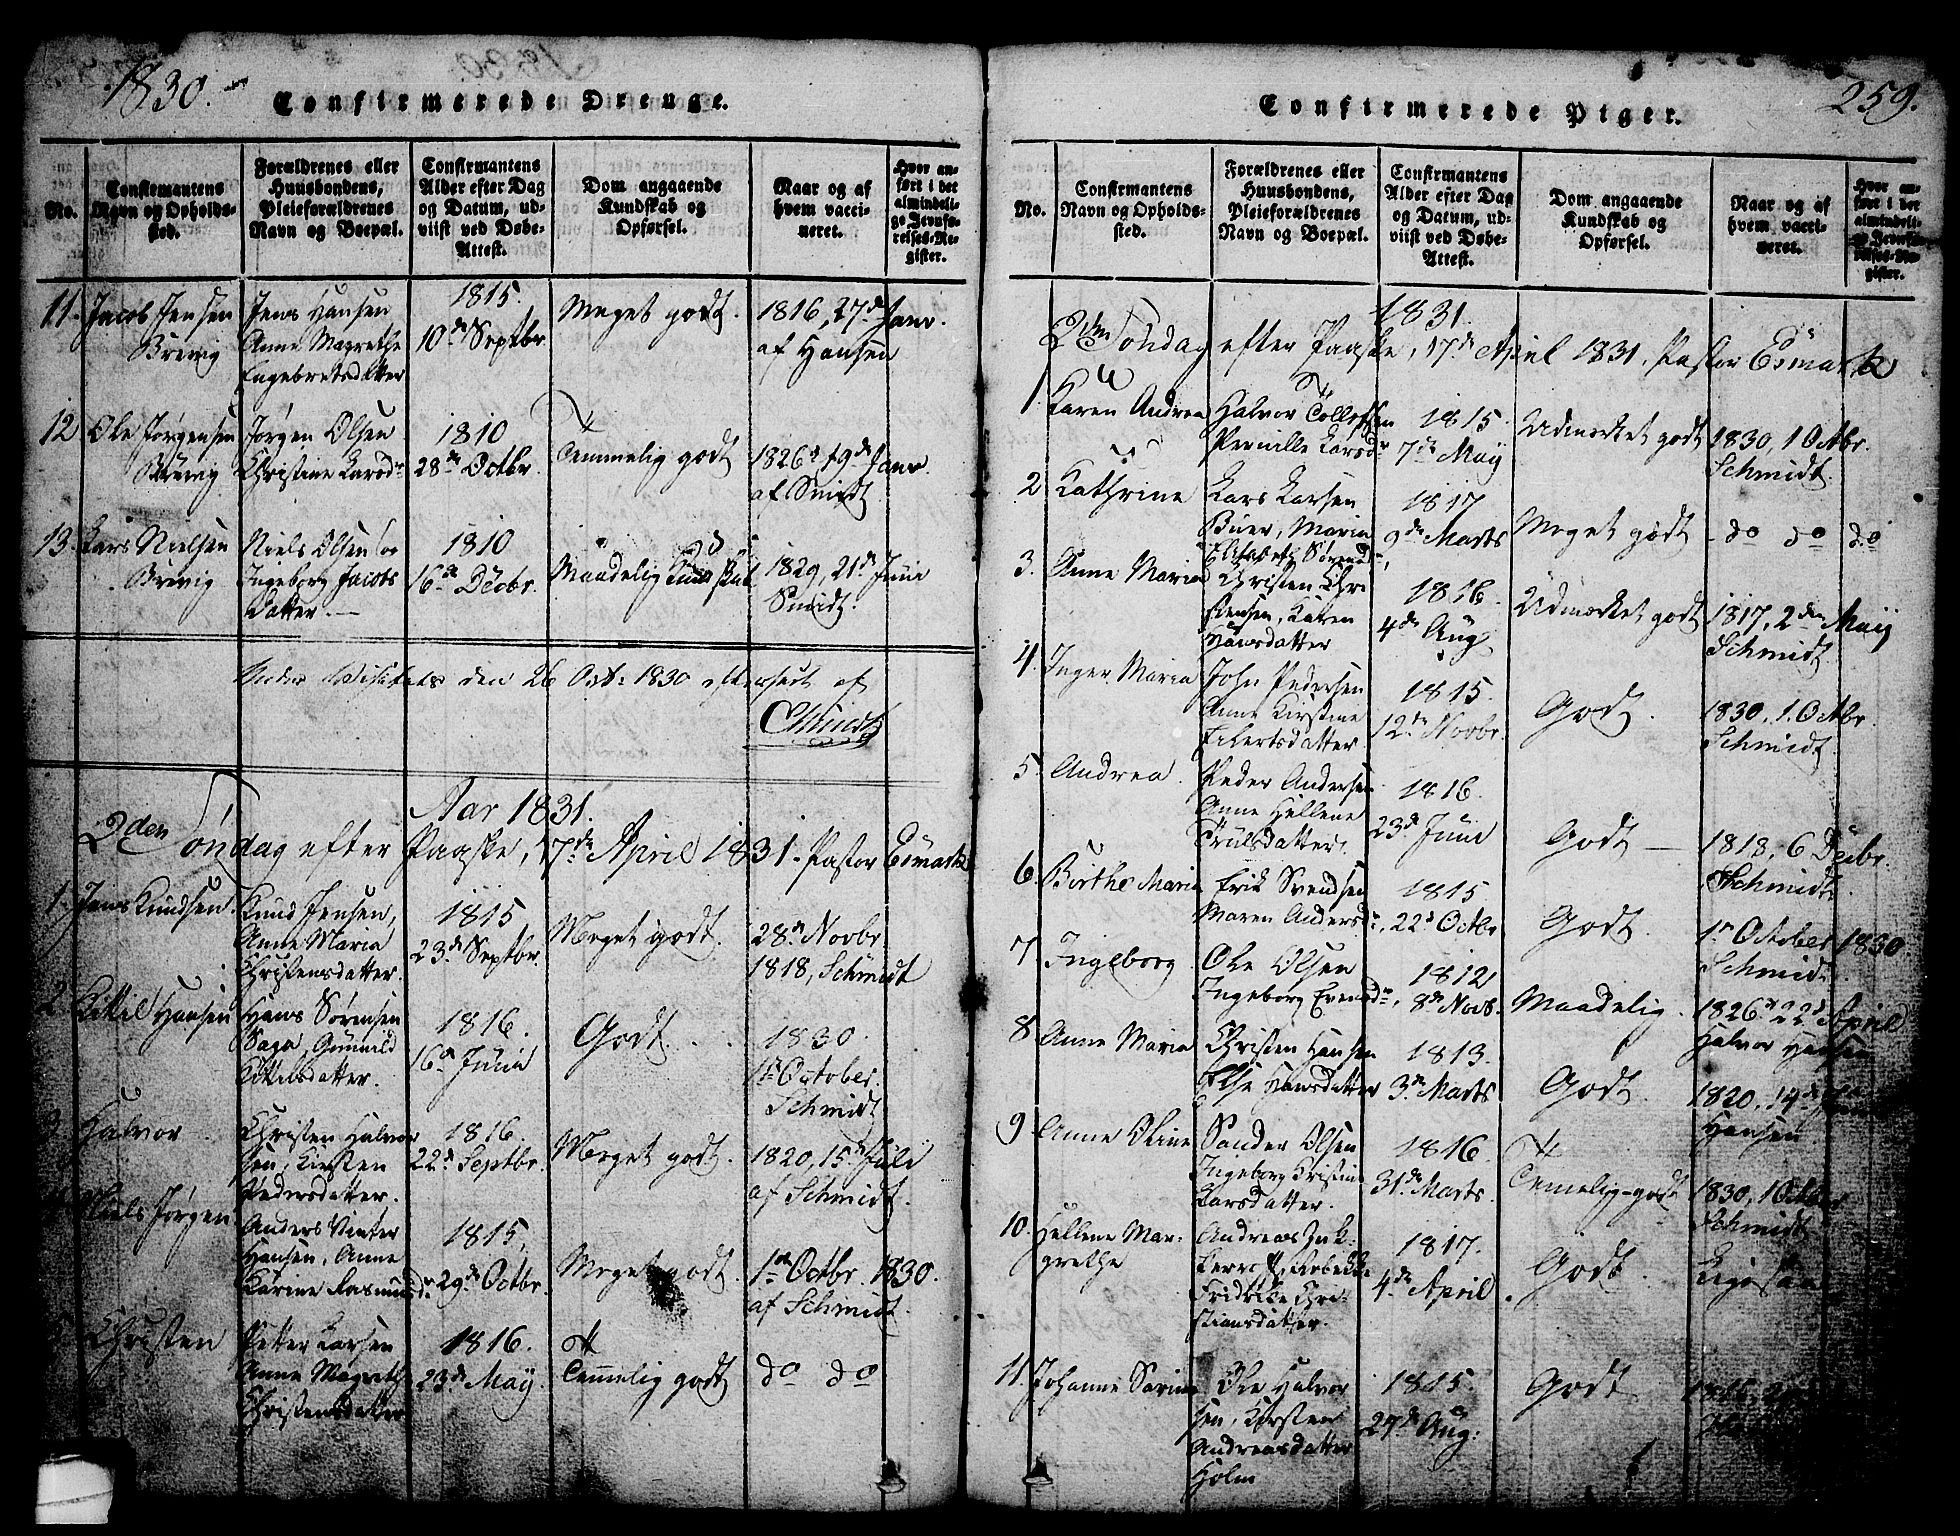 SAKO, Brevik kirkebøker, G/Ga/L0001: Klokkerbok nr. 1, 1814-1845, s. 259